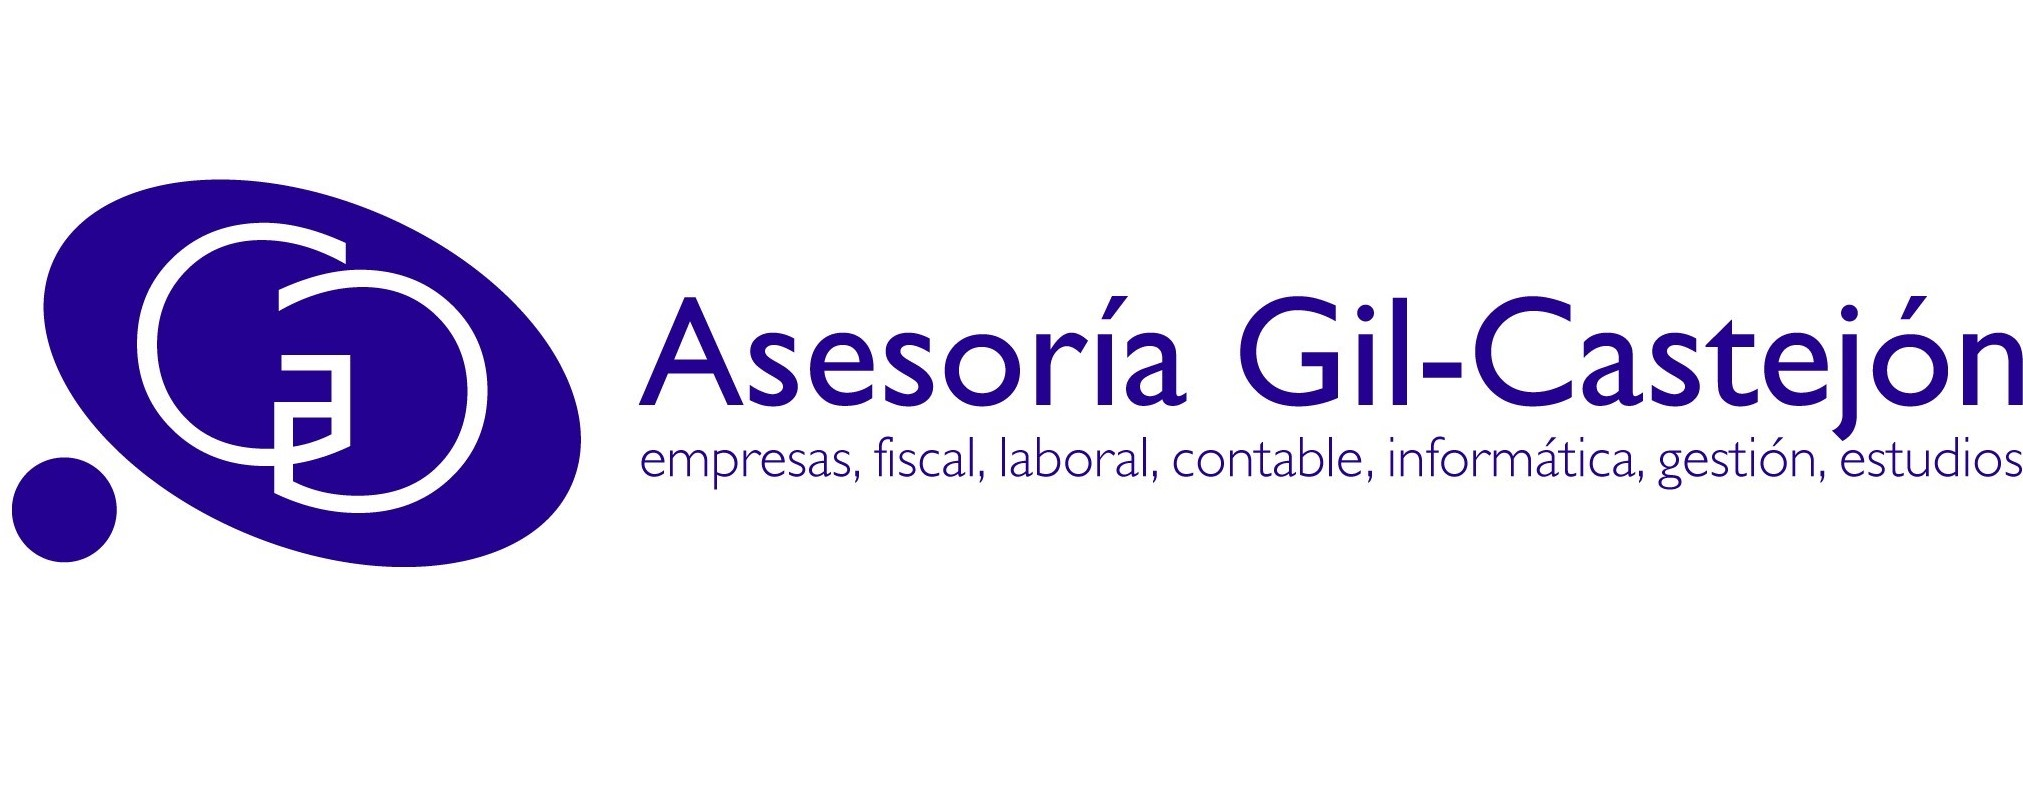 Asesoría Gil-Castejón